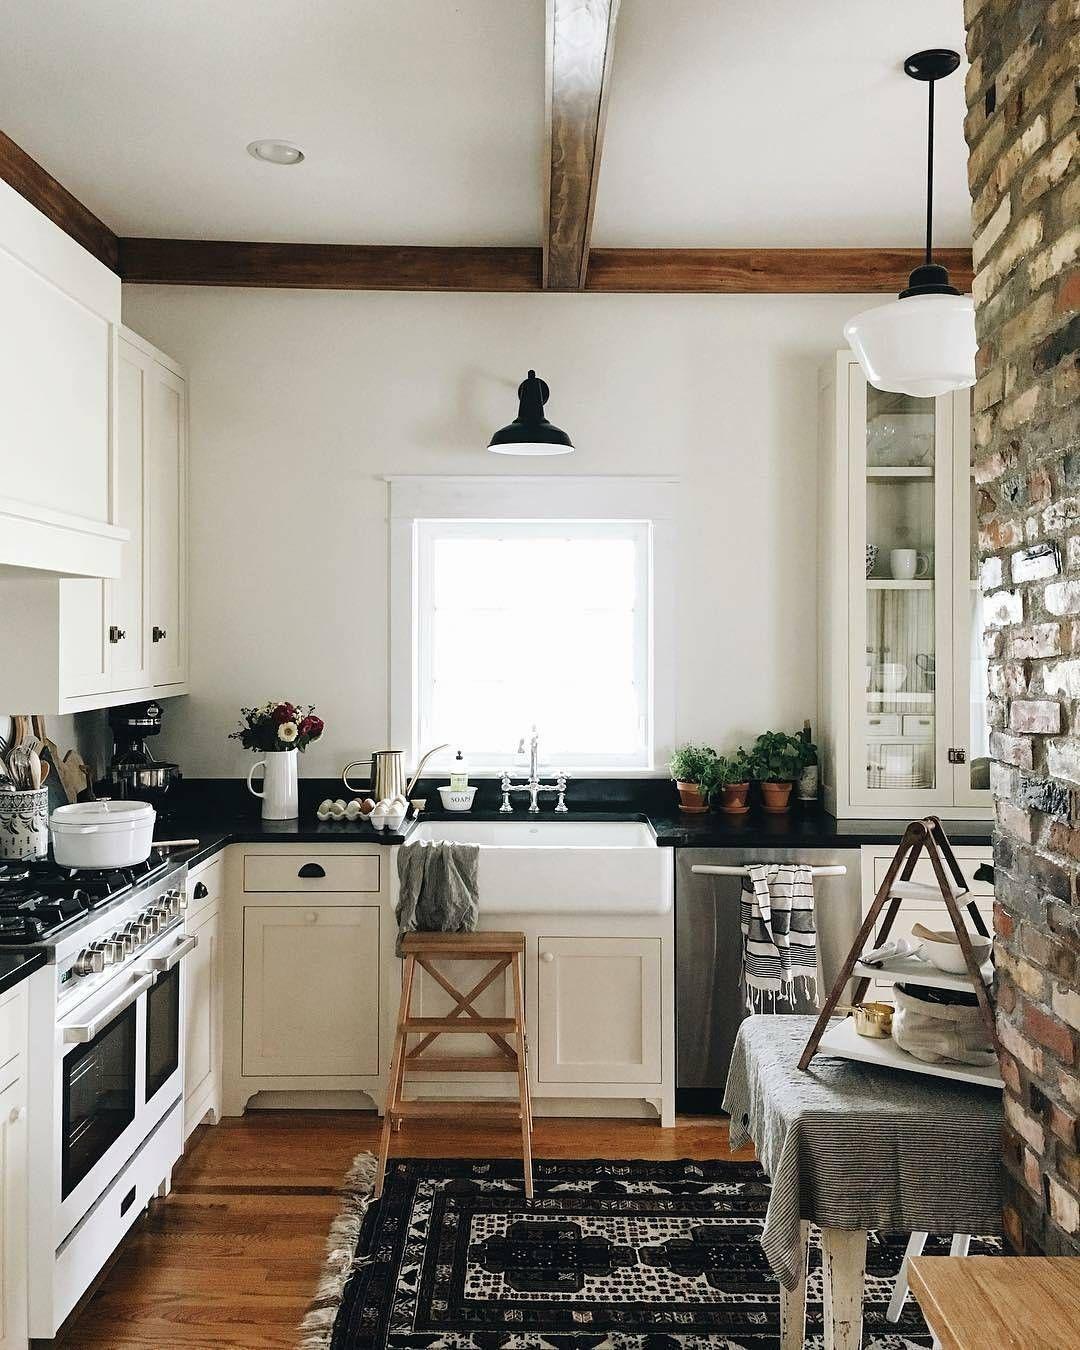 Pin di Kate Robbins su <3 new house | Pinterest